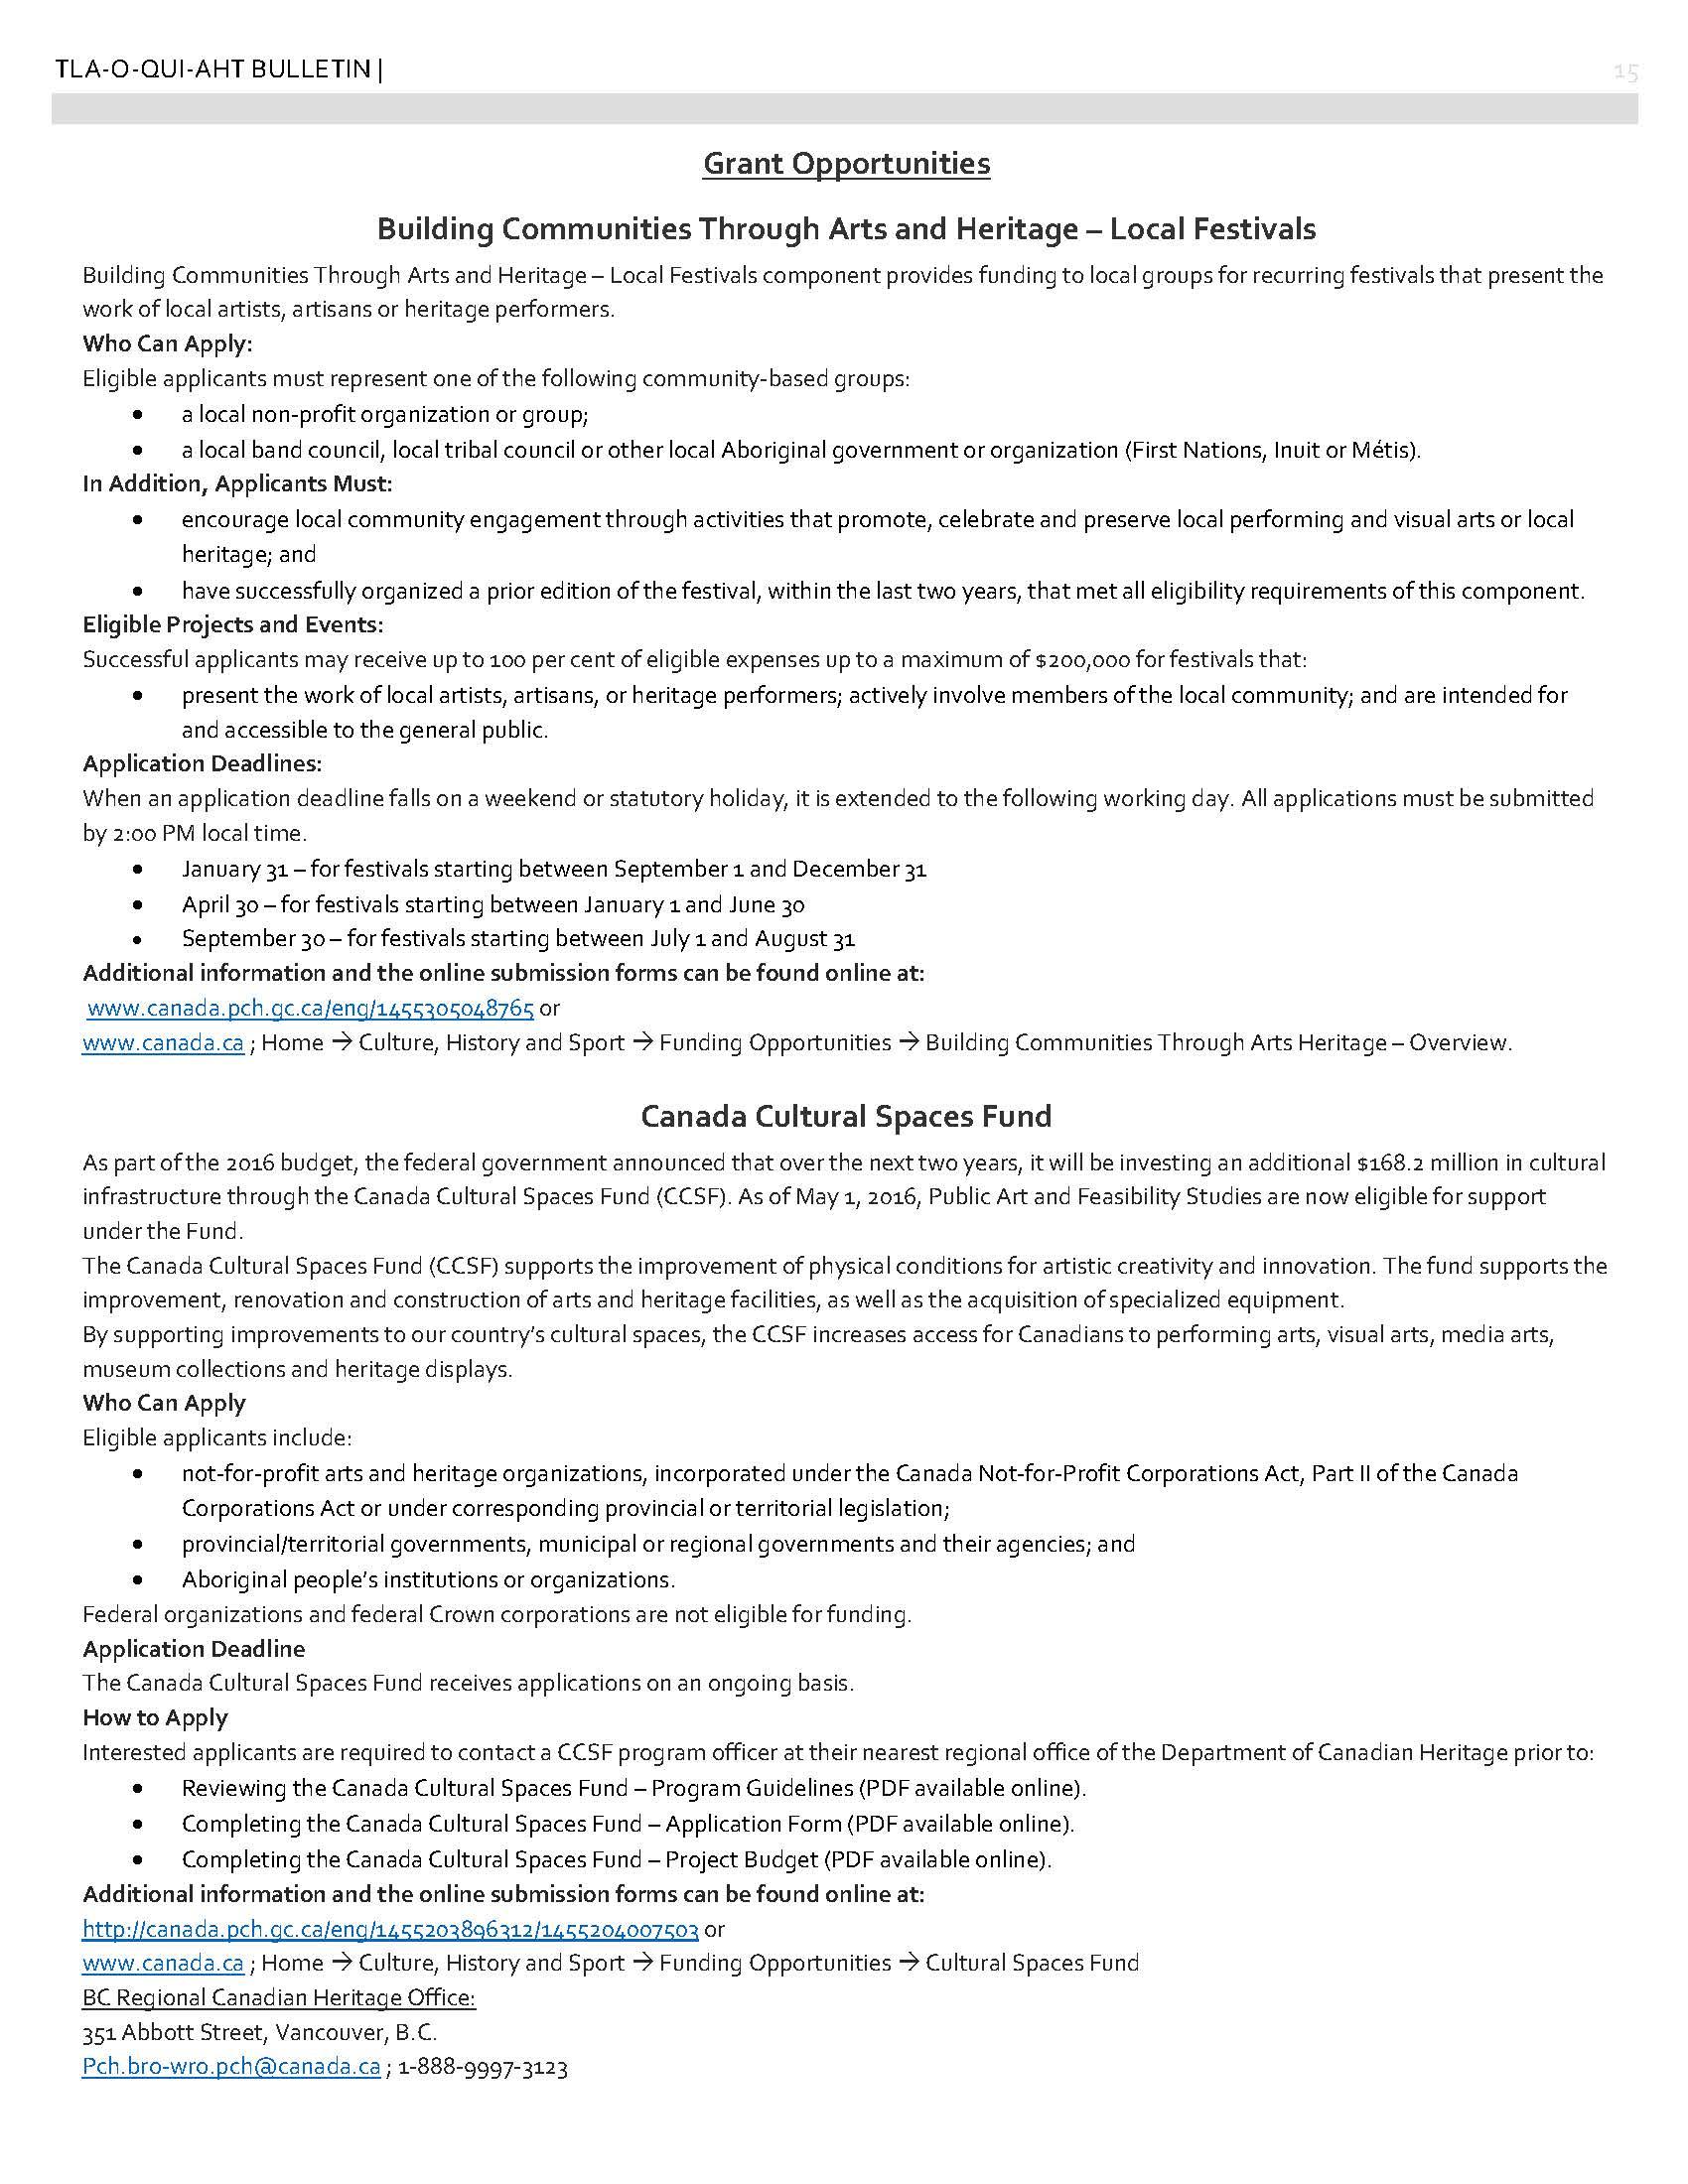 0TFN Bulletin Nov 15-2016_Page_15.jpg